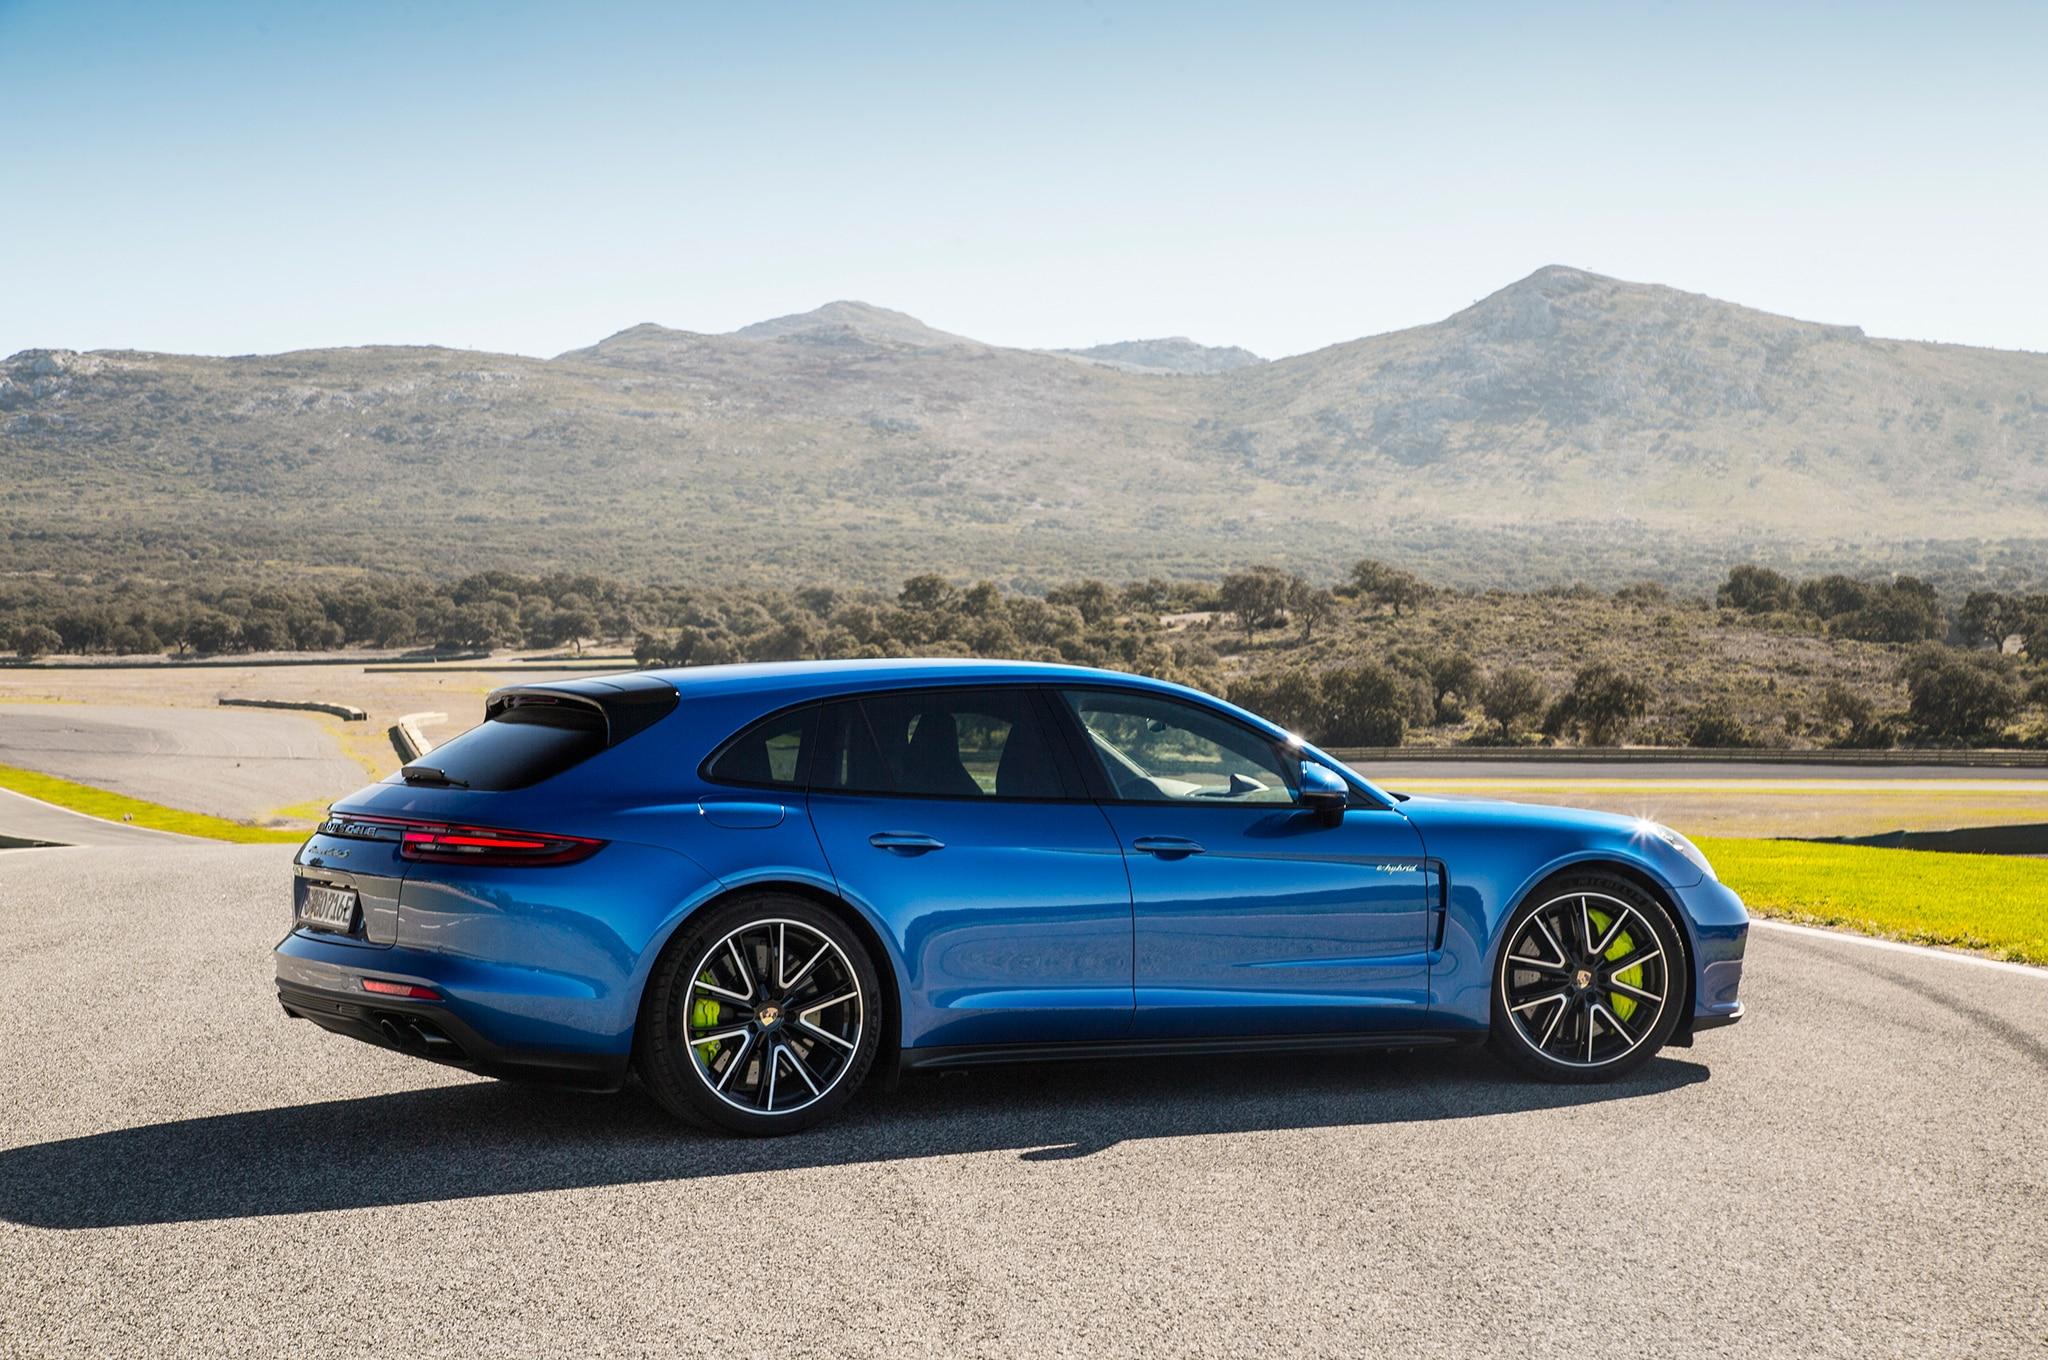 2018 Porsche Panamera Review >> 2018 Porsche Panamera Turbo S E-Hybrid Sport Turismo First Drive Review | Automobile Magazine